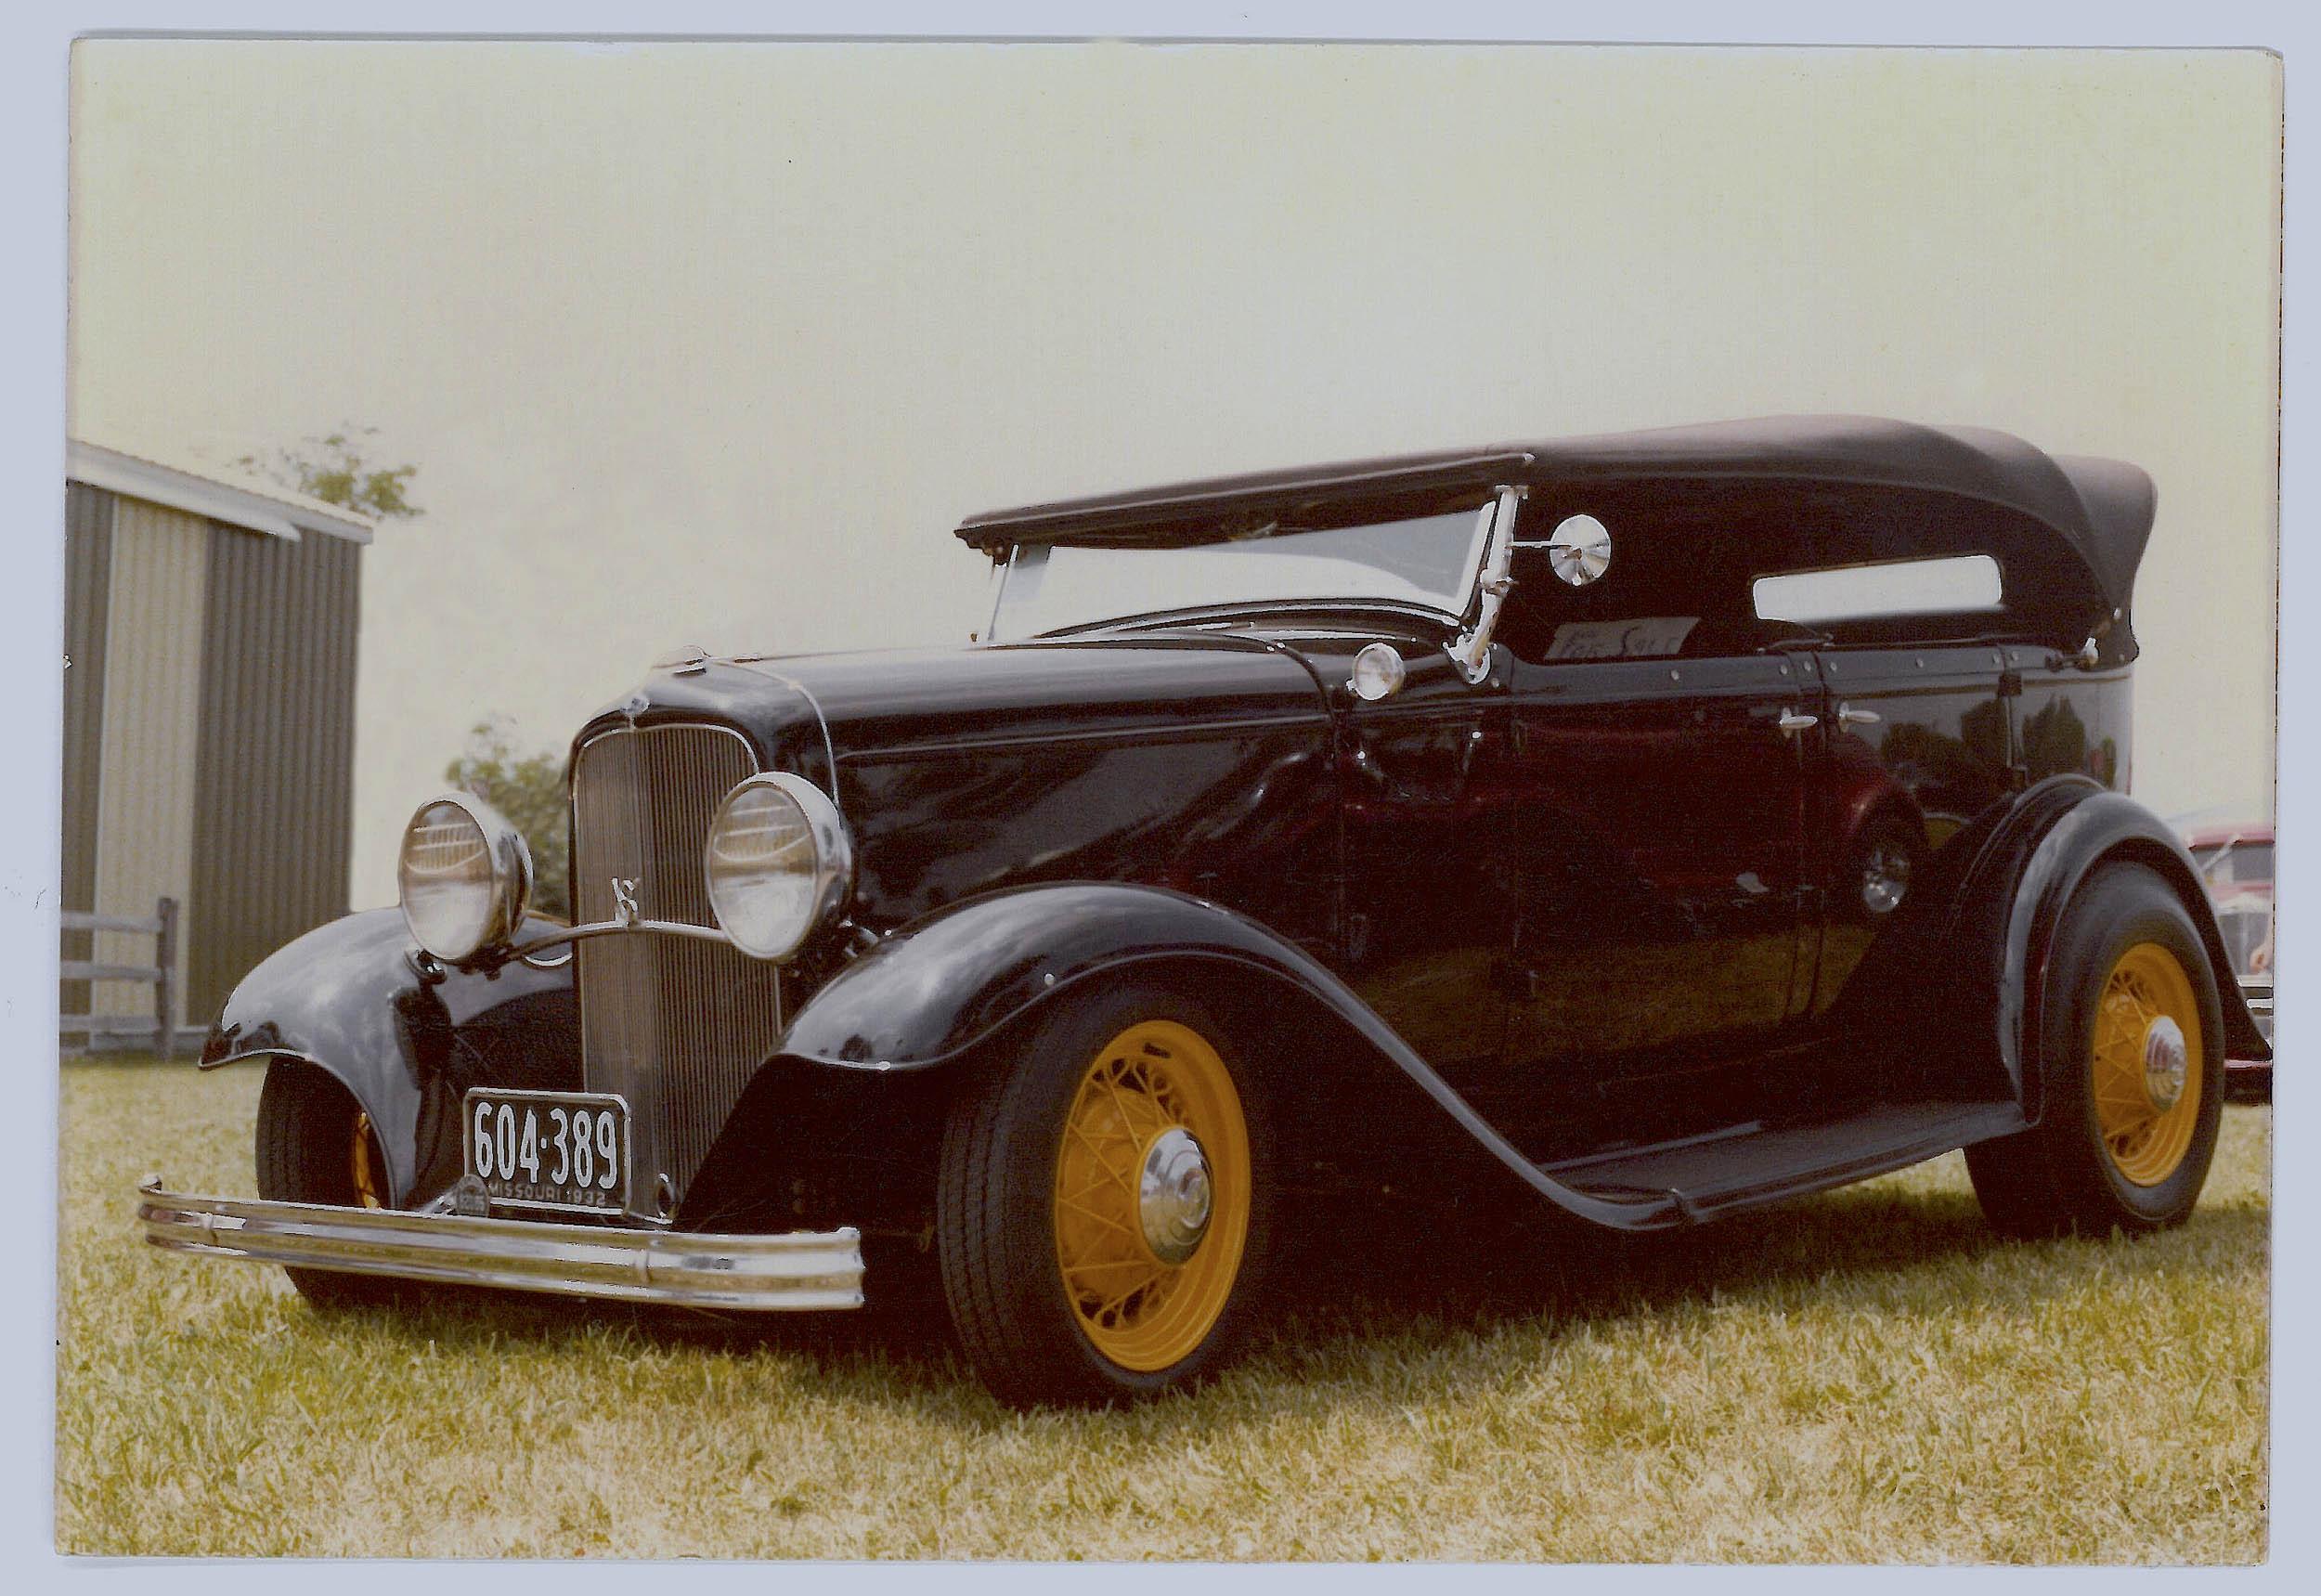 Roger Bell's 1932 Ford phaeton was built in 1982.